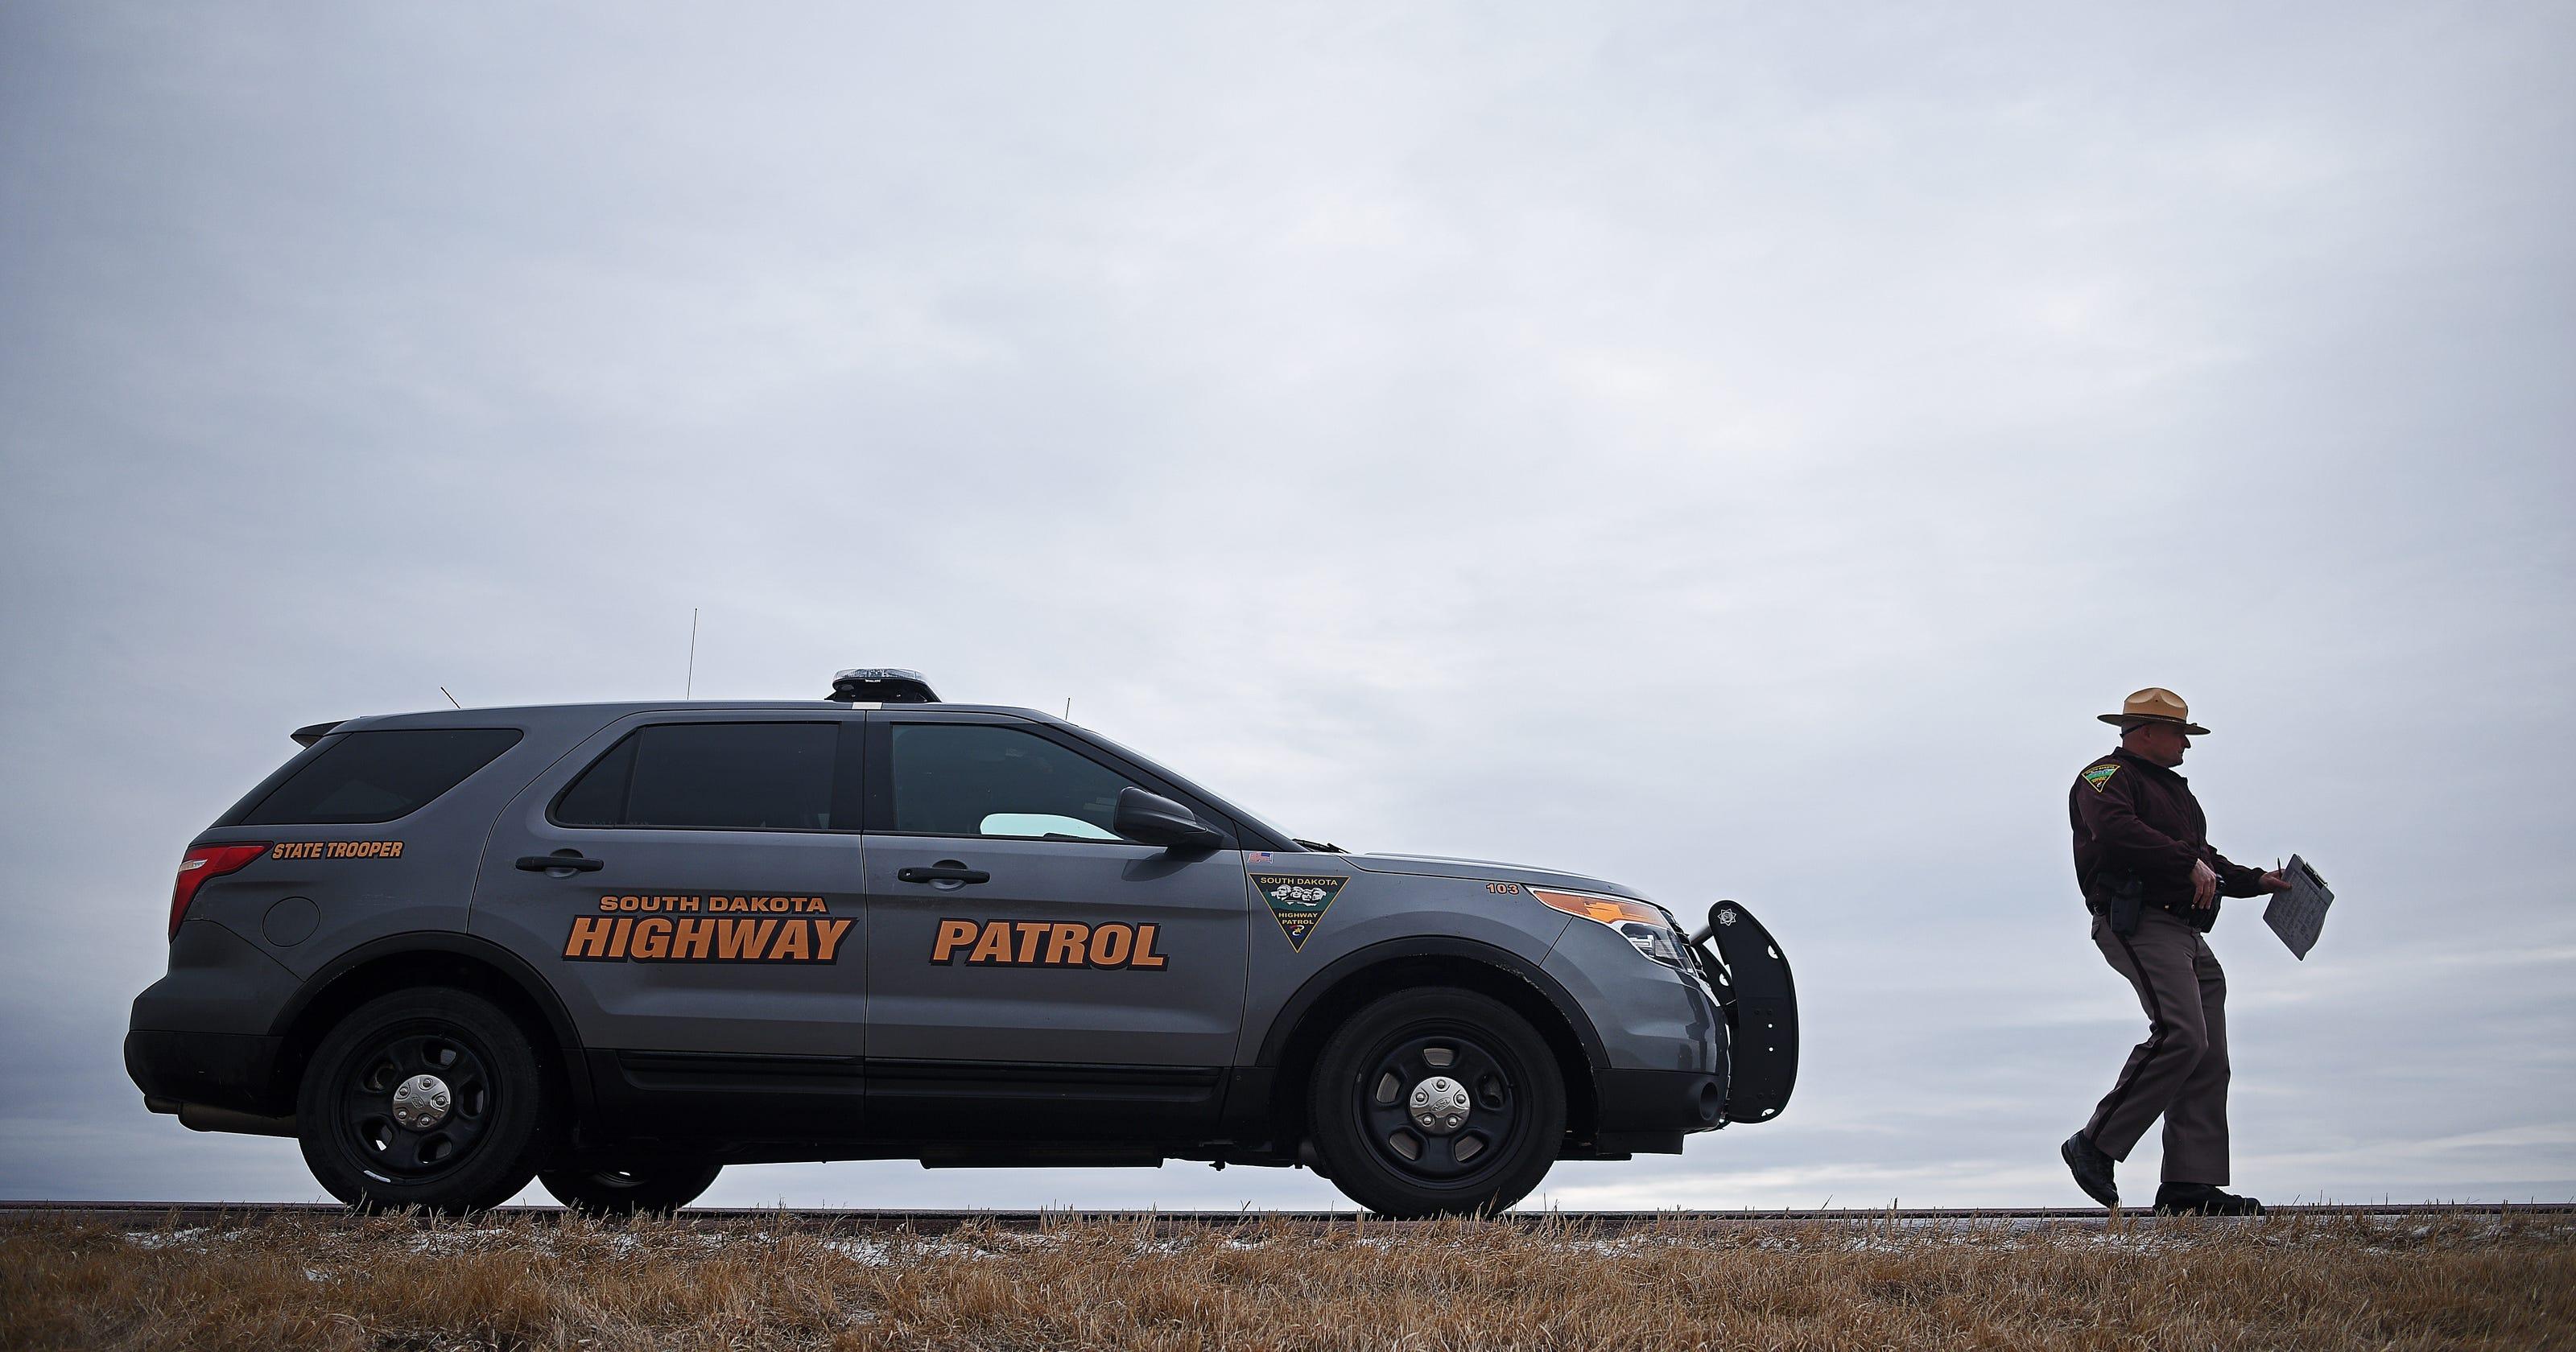 Speeding tickets surge after change to 80 mph limit